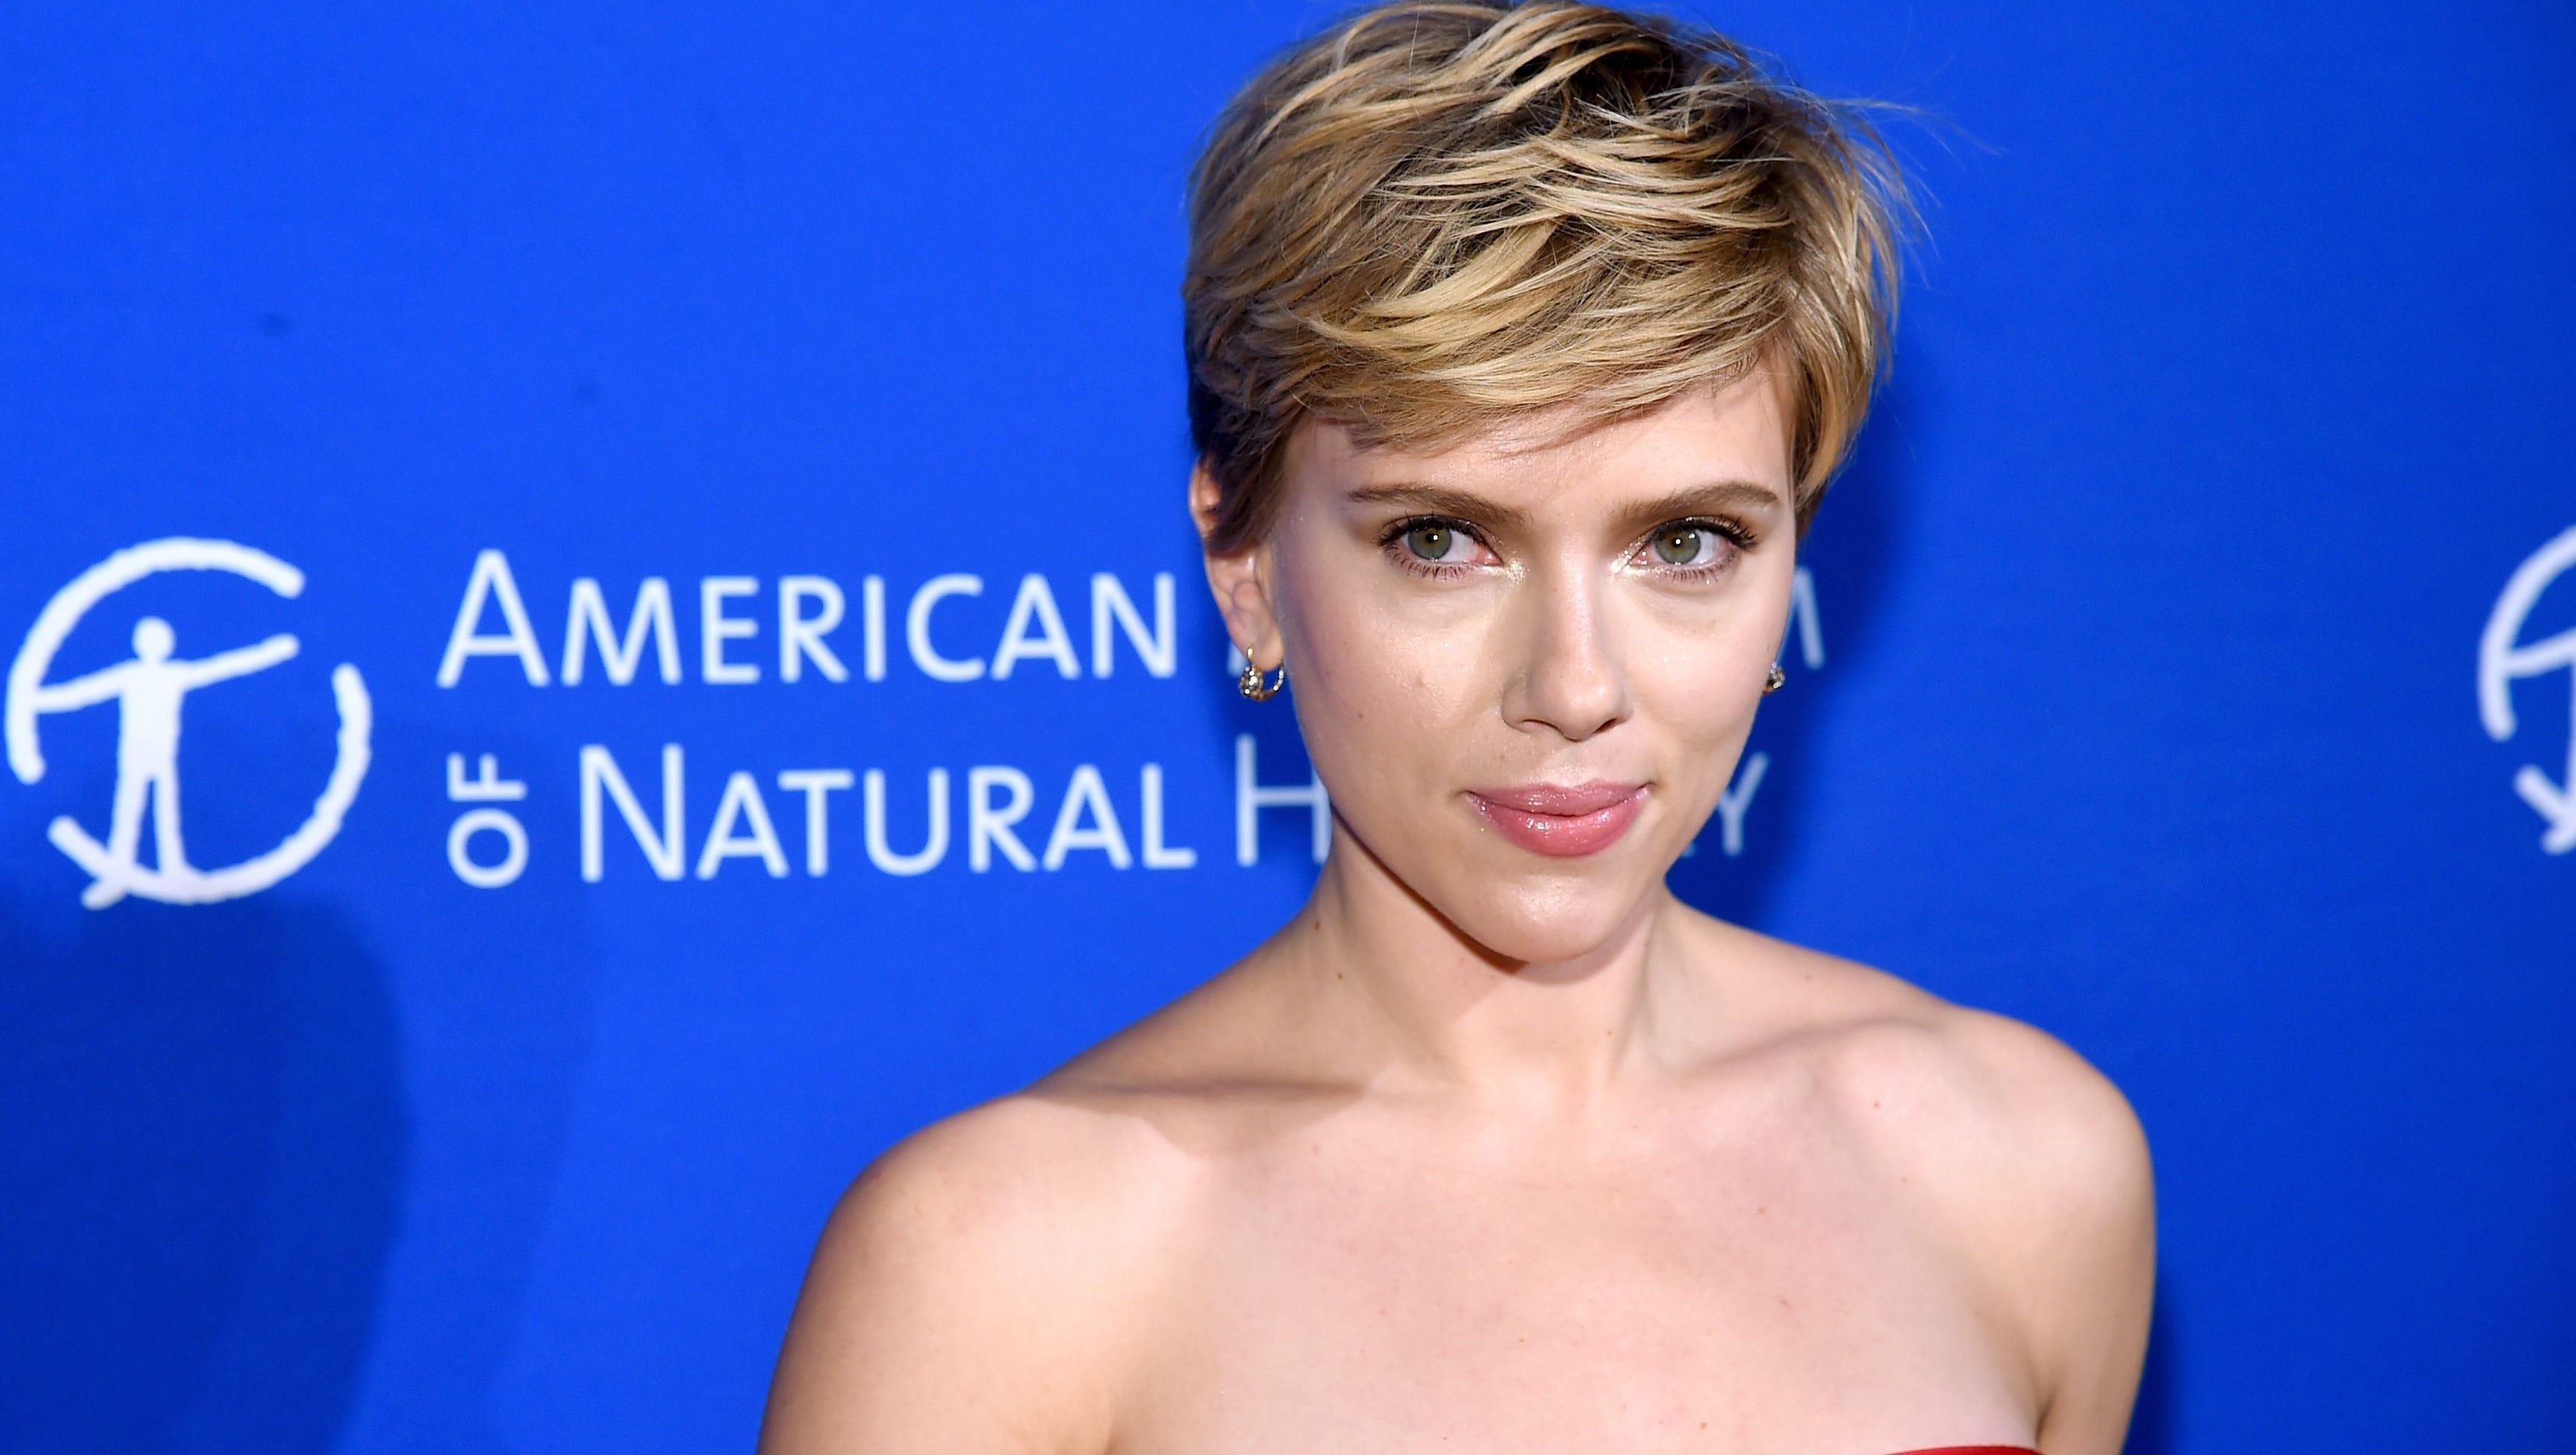 Scarlett Johansson Faces Backlash Again For Role As Transgender Man